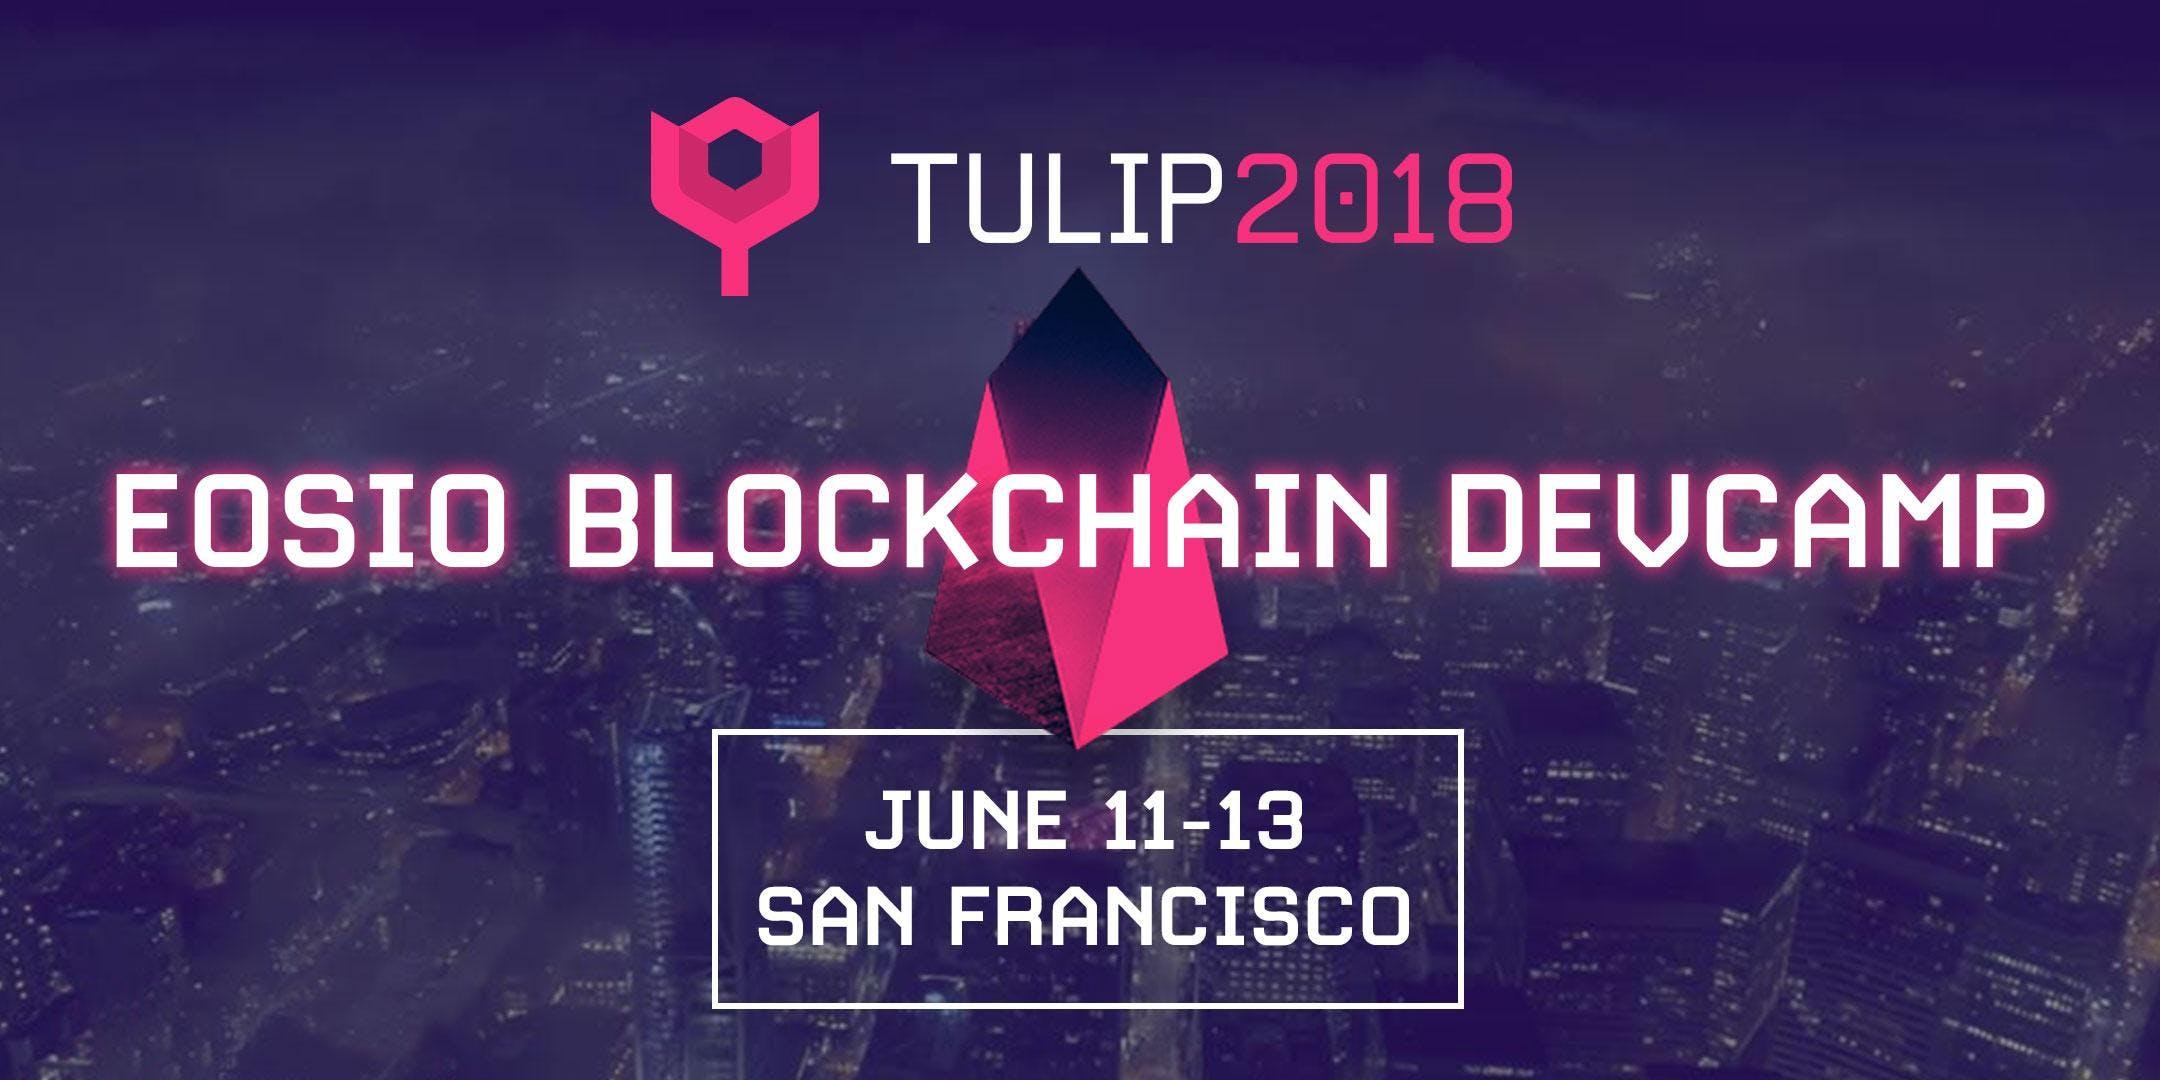 Eosio Blockchain Devcamp At Uc Berkeley Extension San Francisco